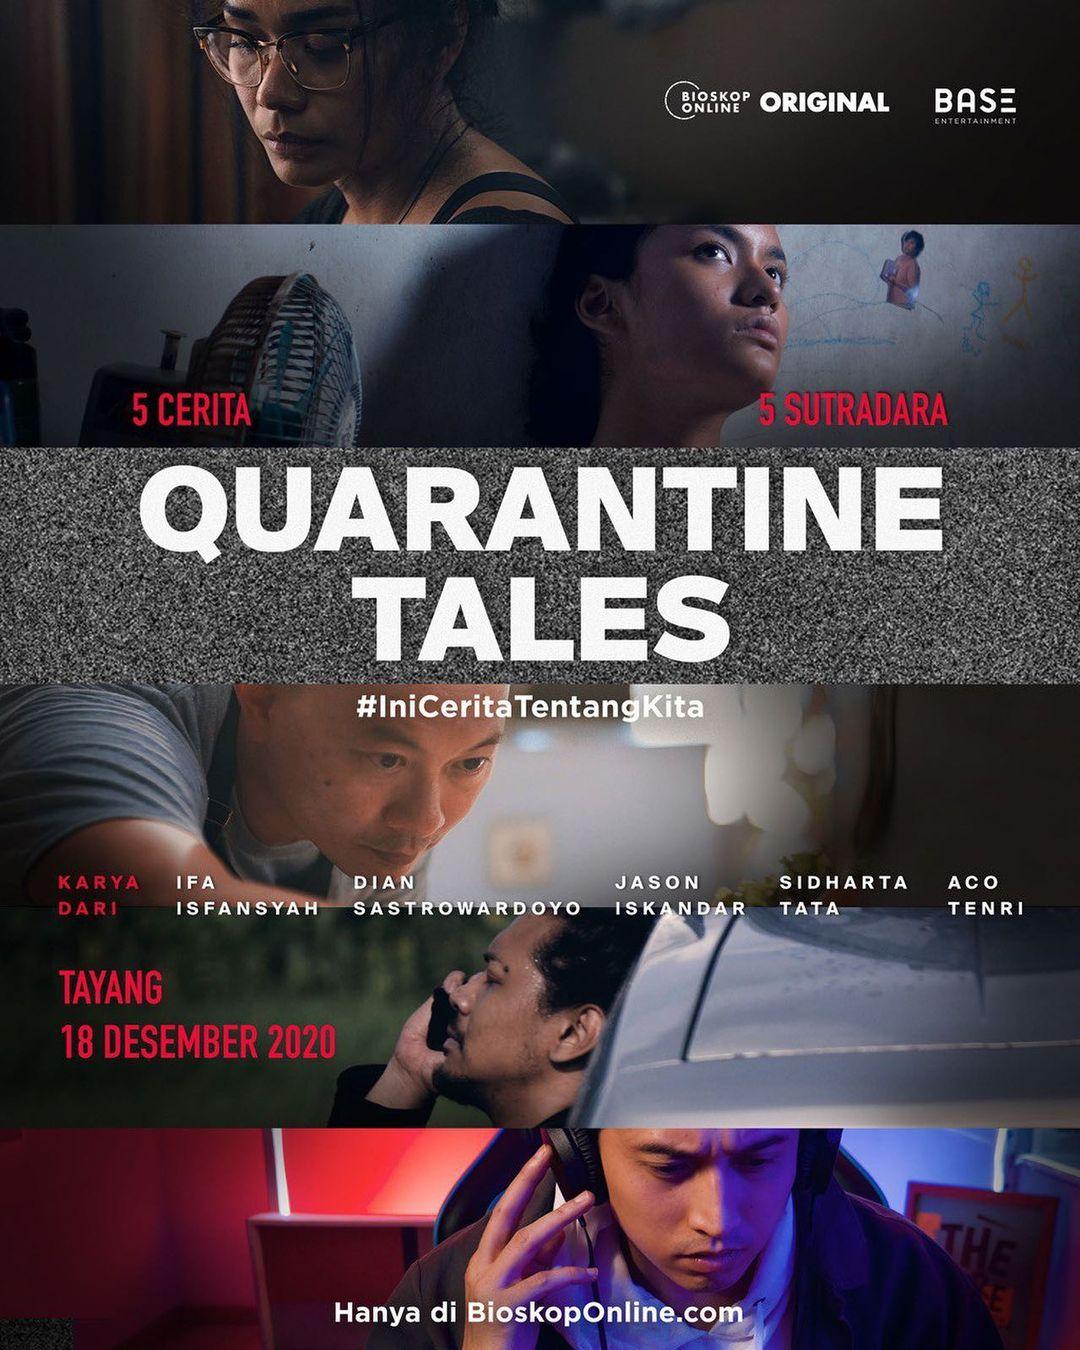 Download Quarantine Tales (2020) Full Movie   Stream Quarantine Tales (2020) Full HD   Watch Quarantine Tales (2020)   Free Download Quarantine Tales (2020) Full Movie